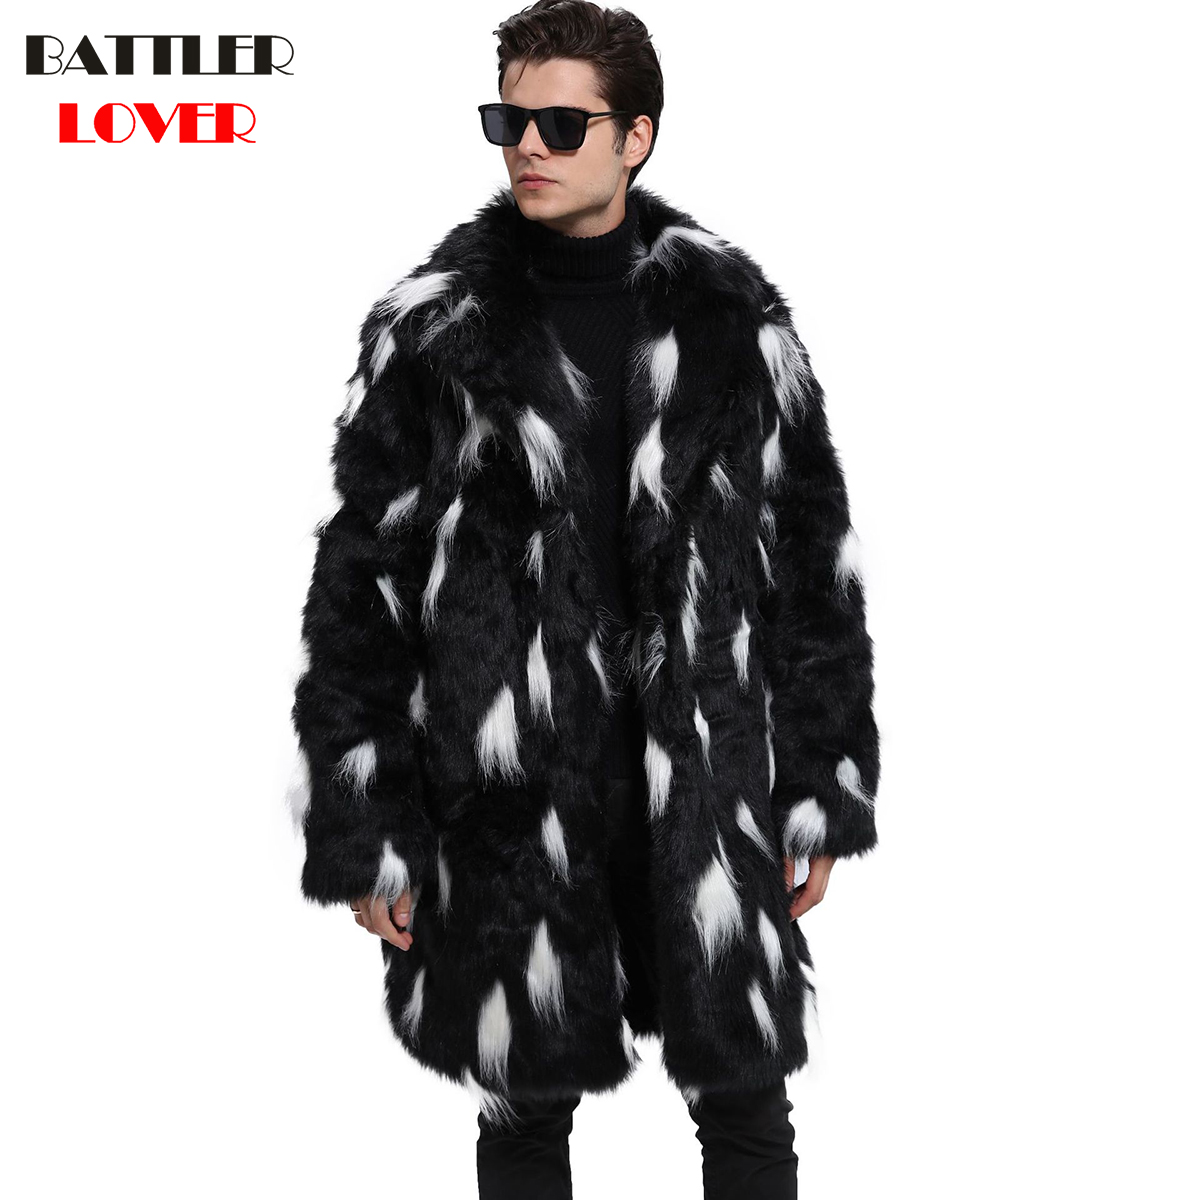 Mens Fur Coat Winter Faux Fur Thick Outwear Coats Men Punk Parka Jackets Hombre Warm Leather Overcoat Genuine Fur Brand Clothing